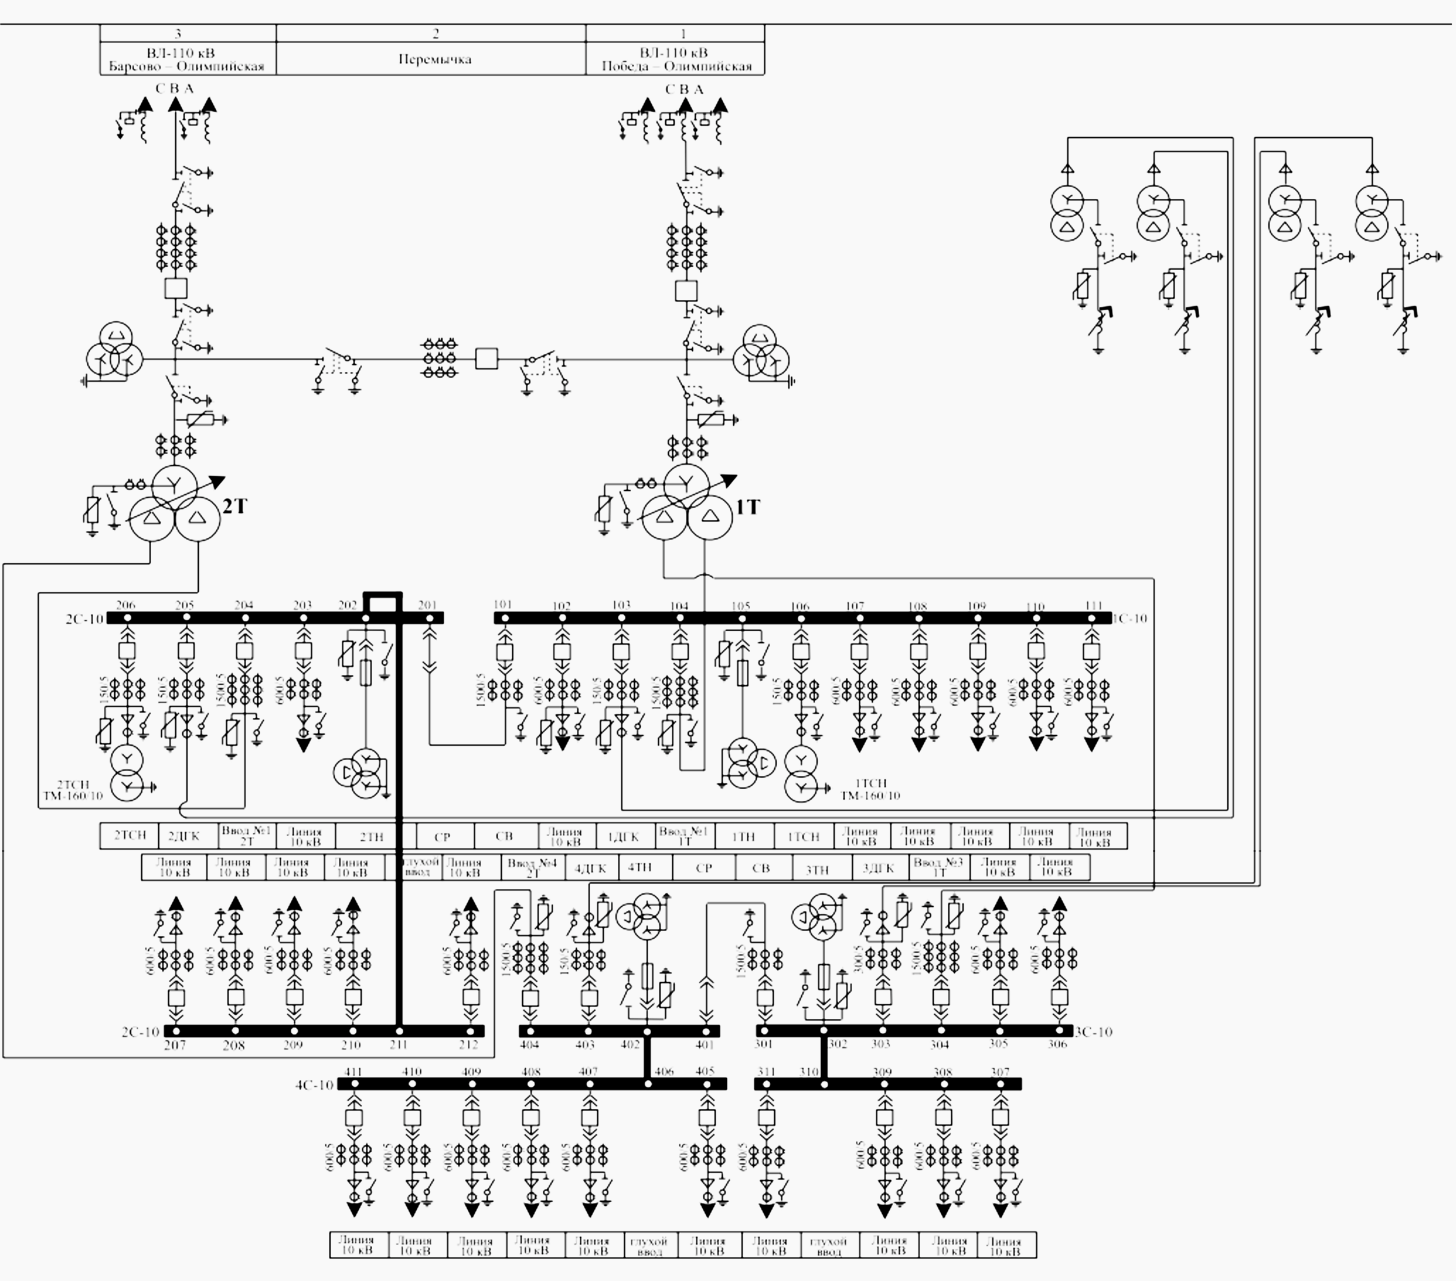 one line wiring diagram symbols wiring diagram online circuit schematic diagram single line electrical diagram symbols [ 1456 x 1281 Pixel ]